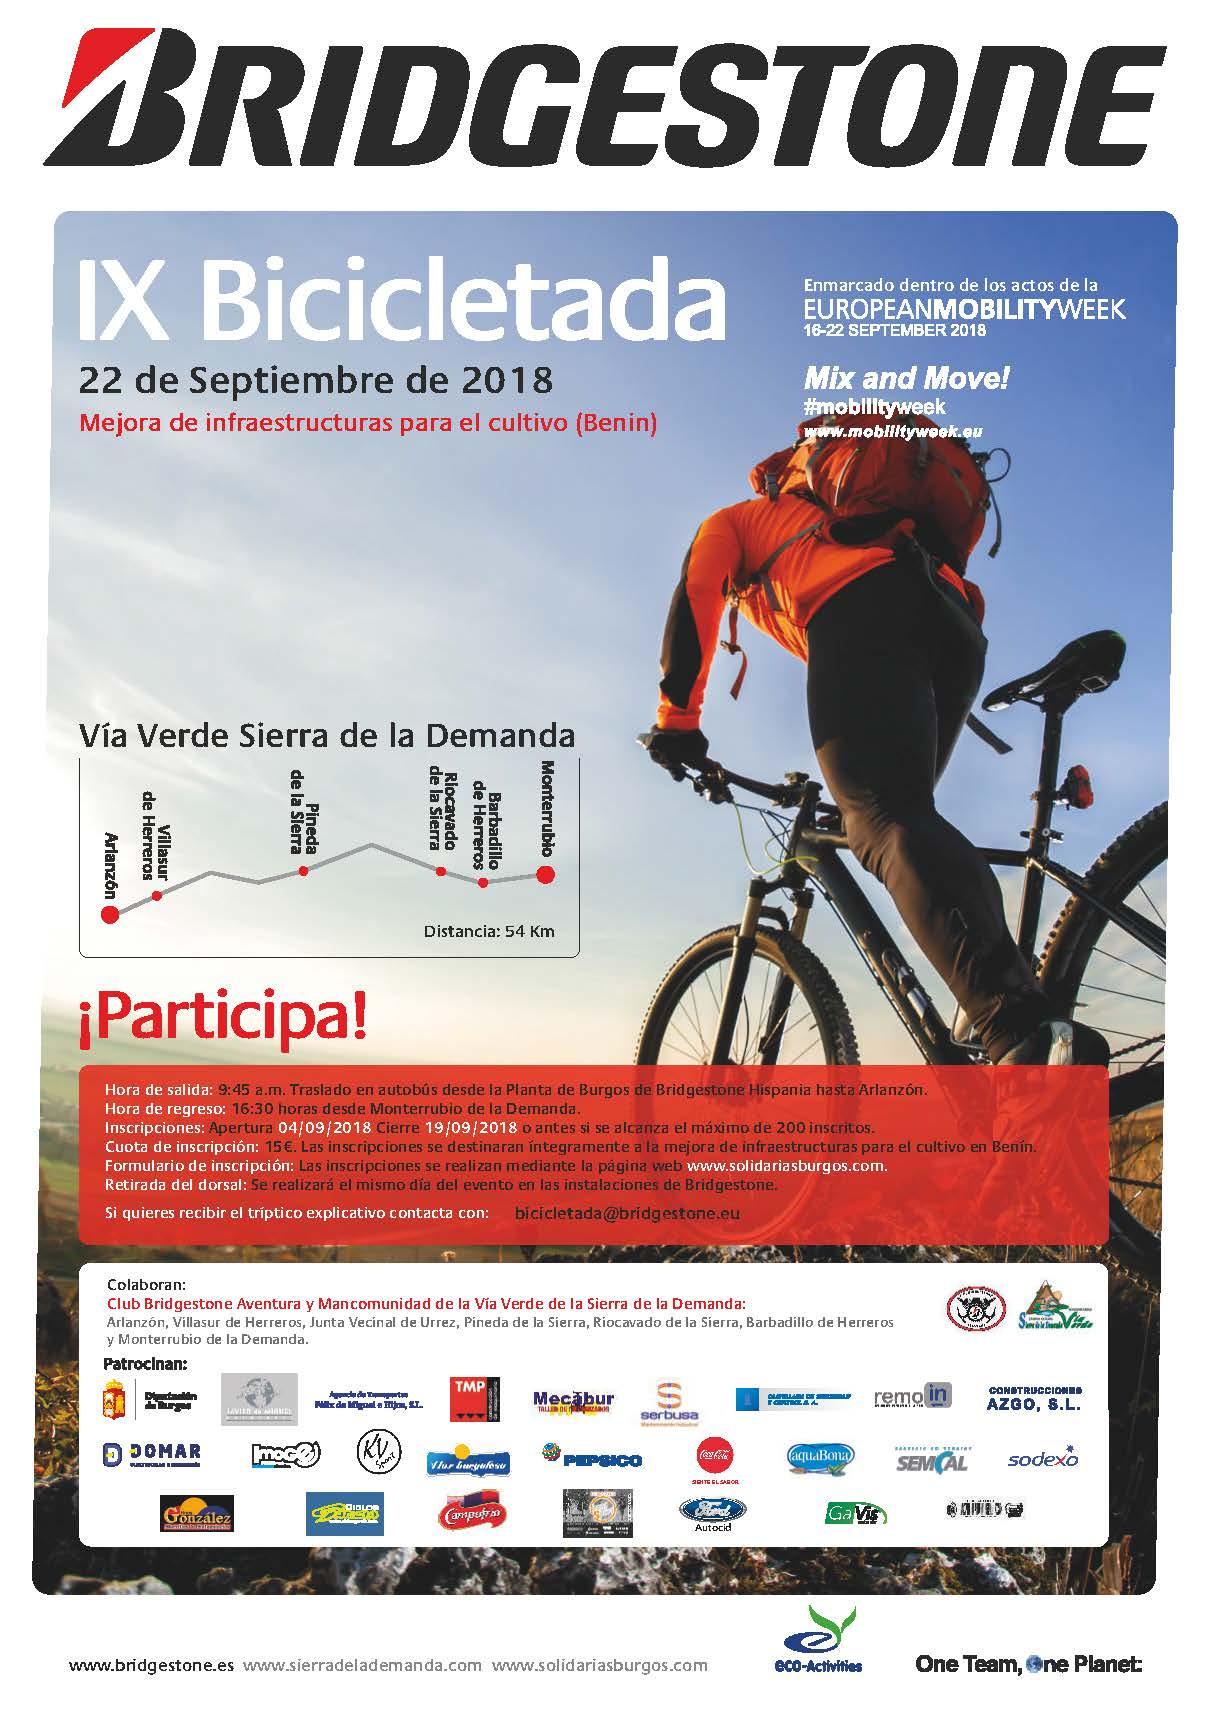 IX Bicicletada Bridgestone